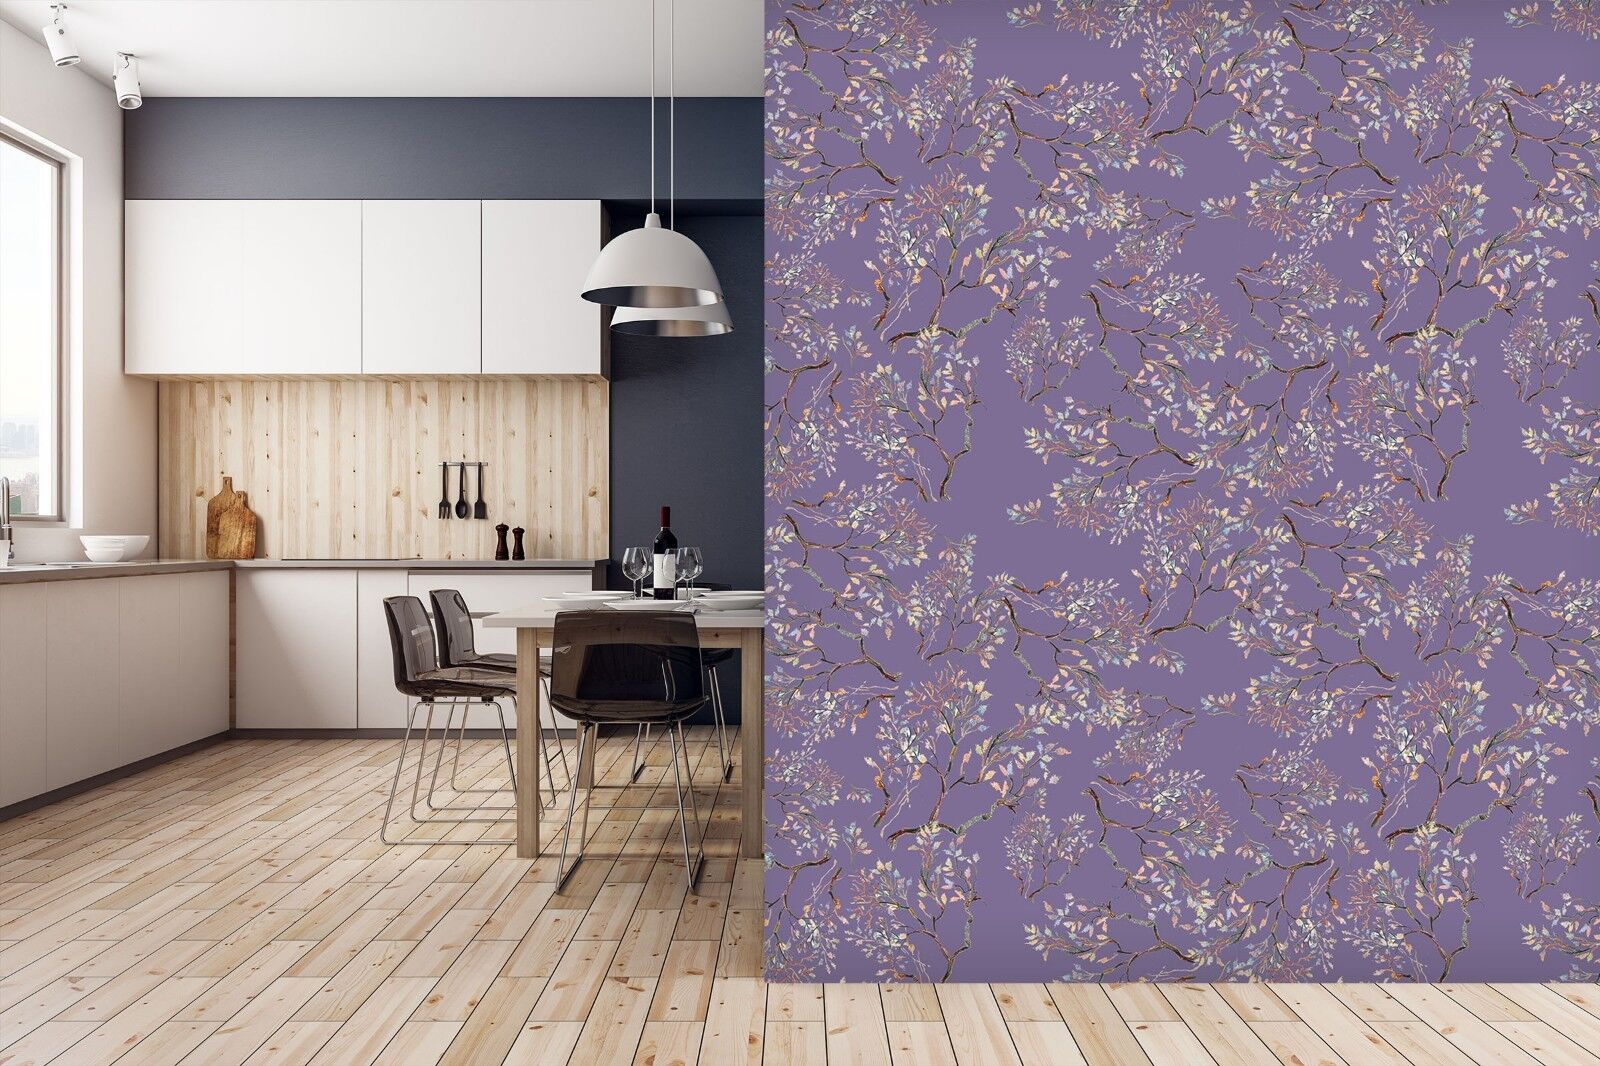 3D Flower Pattern 67 Texture Tiles Marble Wall Paper Decal Wallpaper Mural